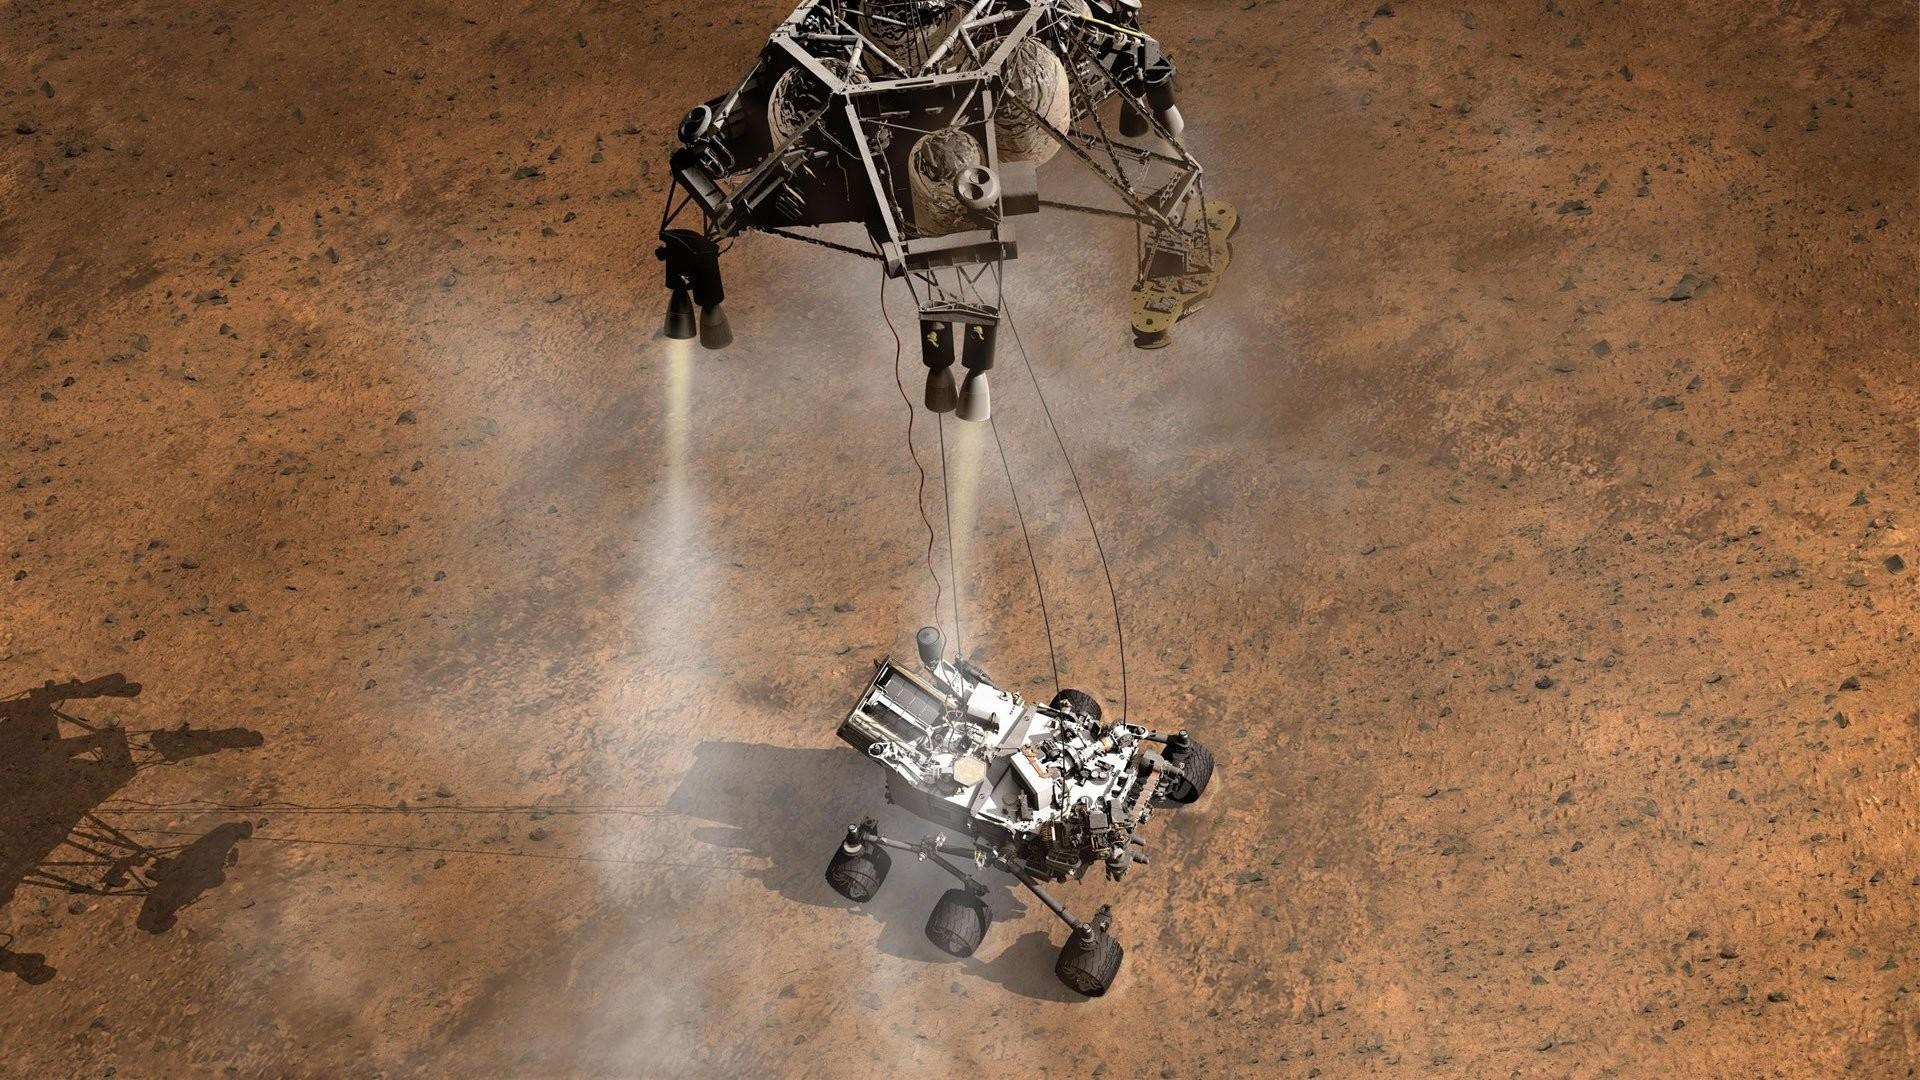 Res: 1920x1080, curiosity rover's mars landing